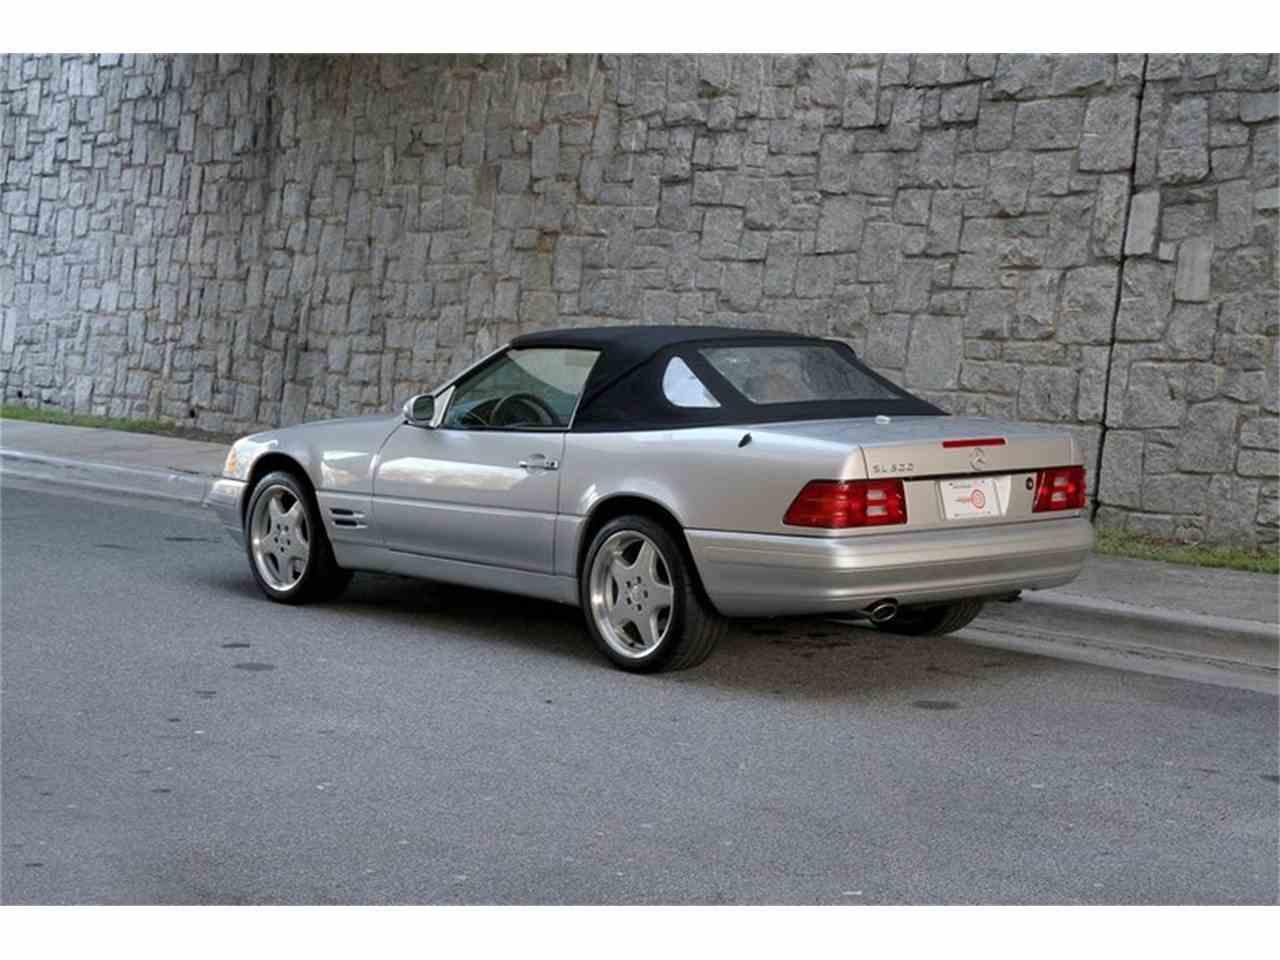 2002 mercedes benz sl500 for sale cc for 2002 mercedes benz sl500 for sale